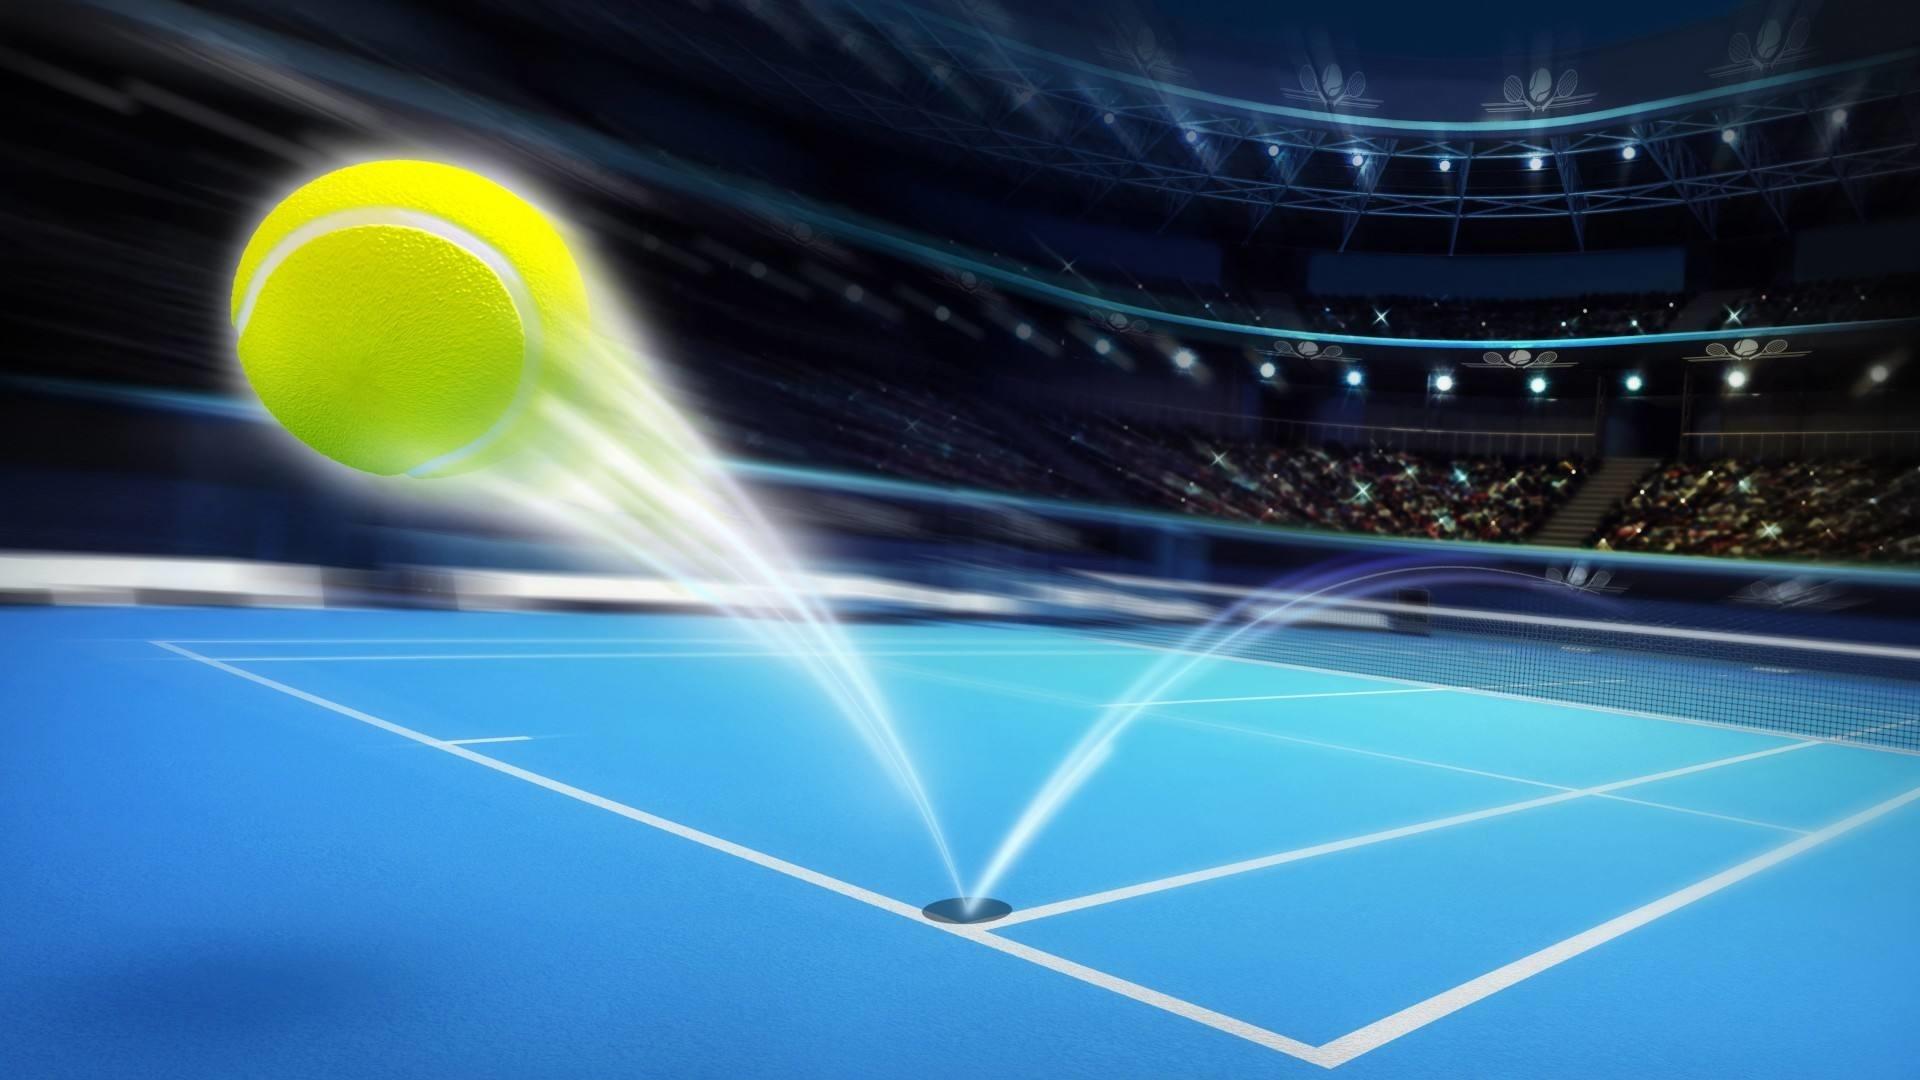 Tennis Ball free photo